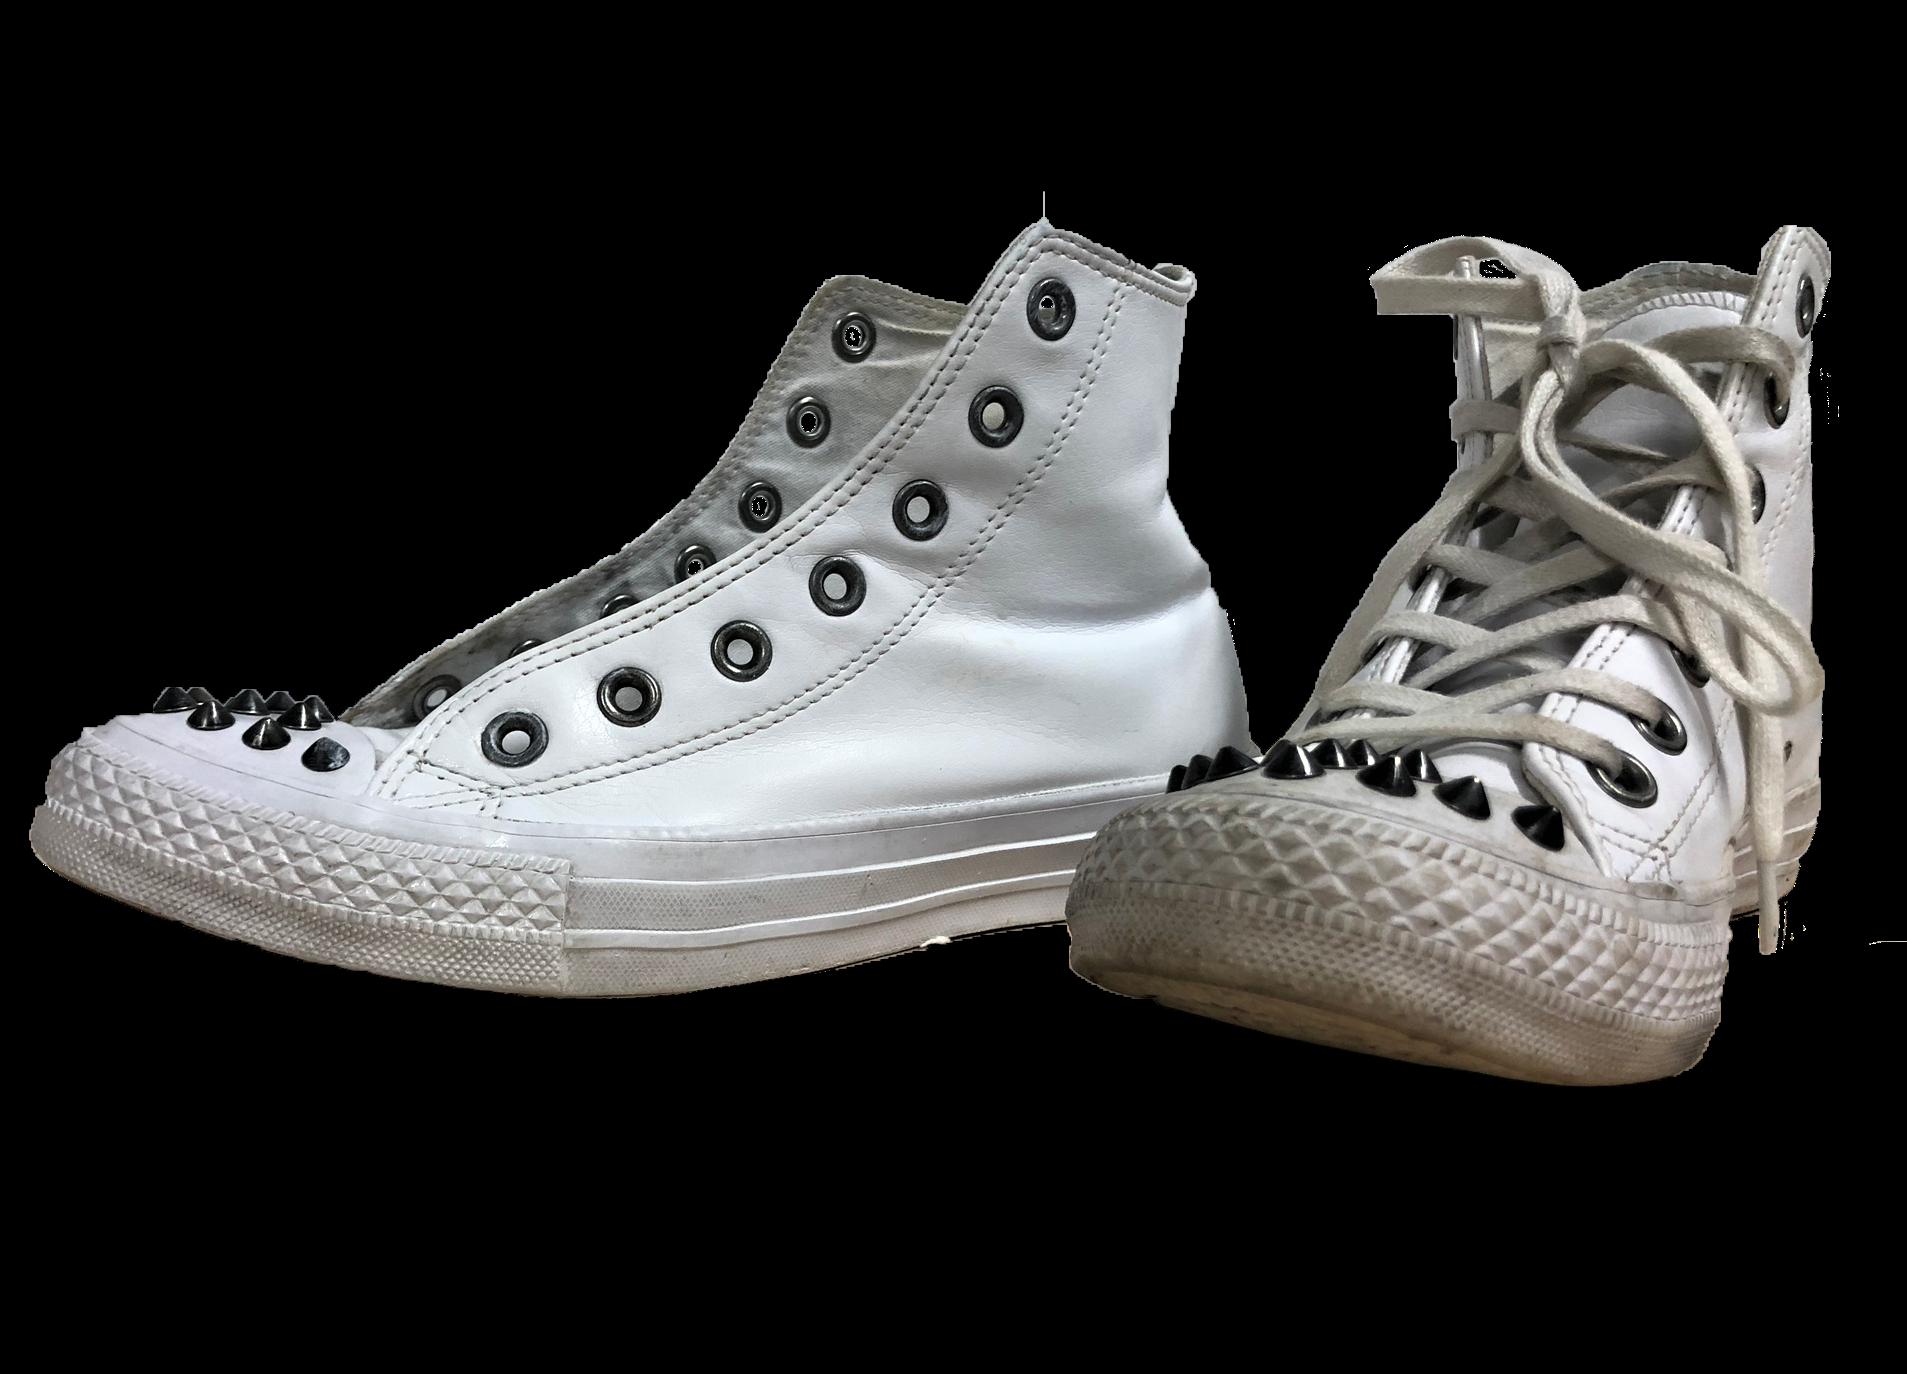 chaussure sale et chaussure propre